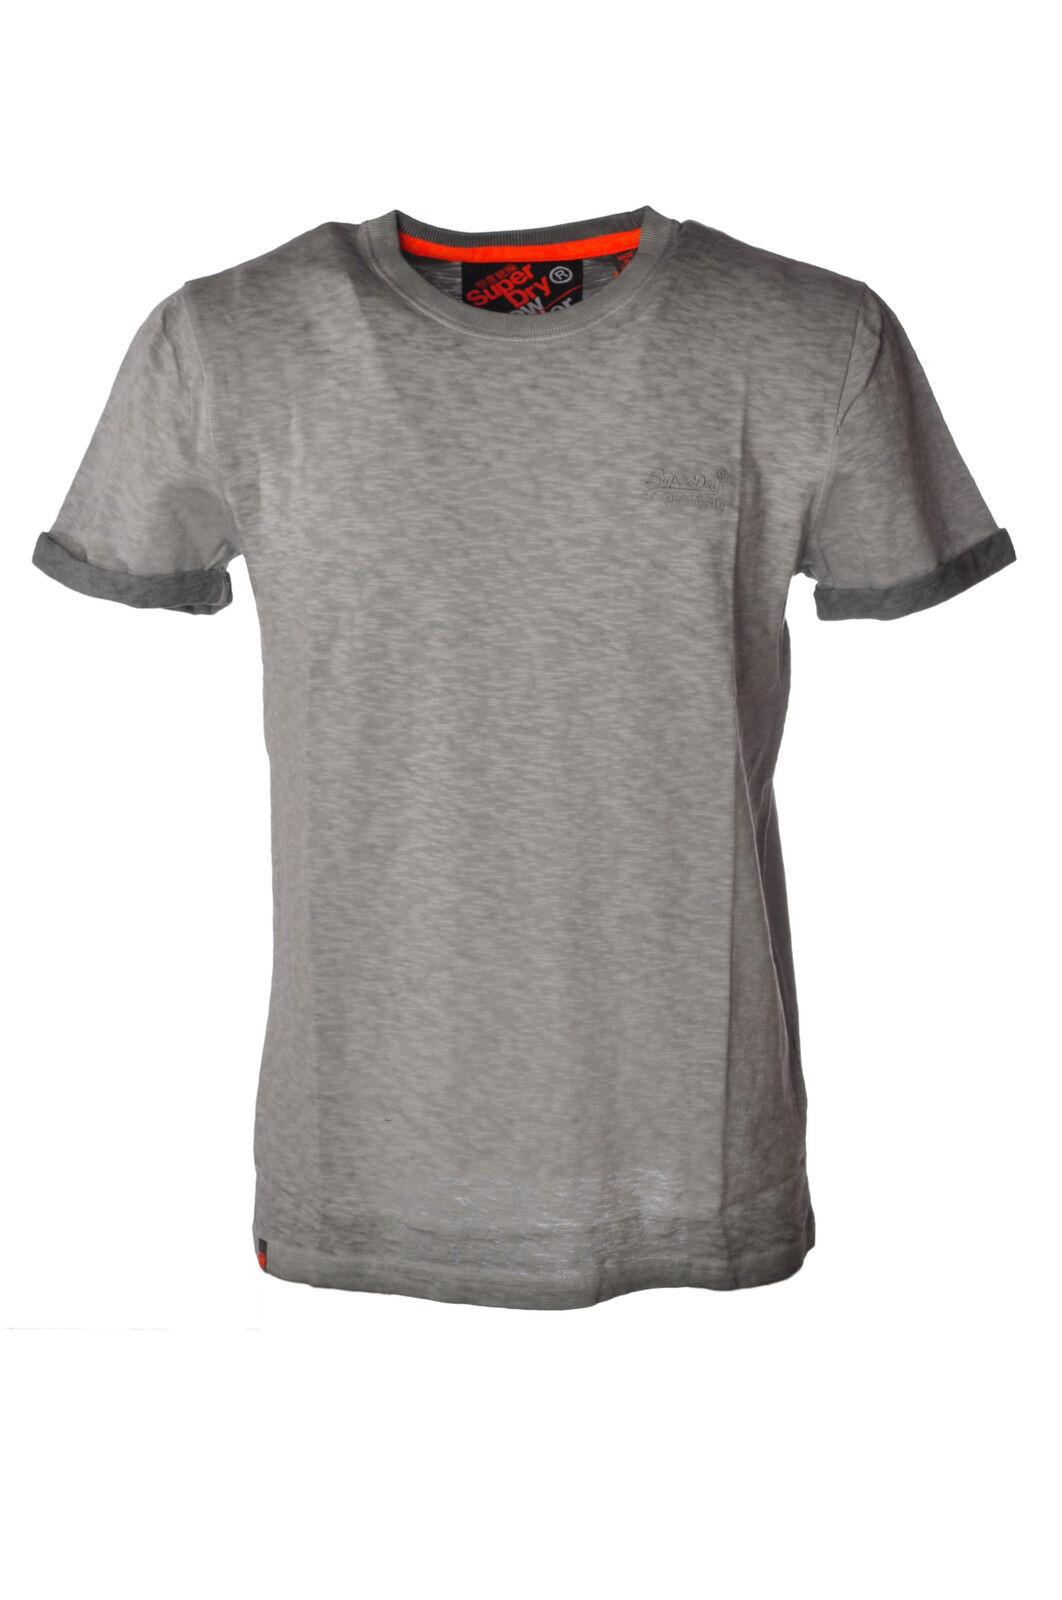 Superdry - Topwear-T-shirts - Man - Grau - 3478814H184204